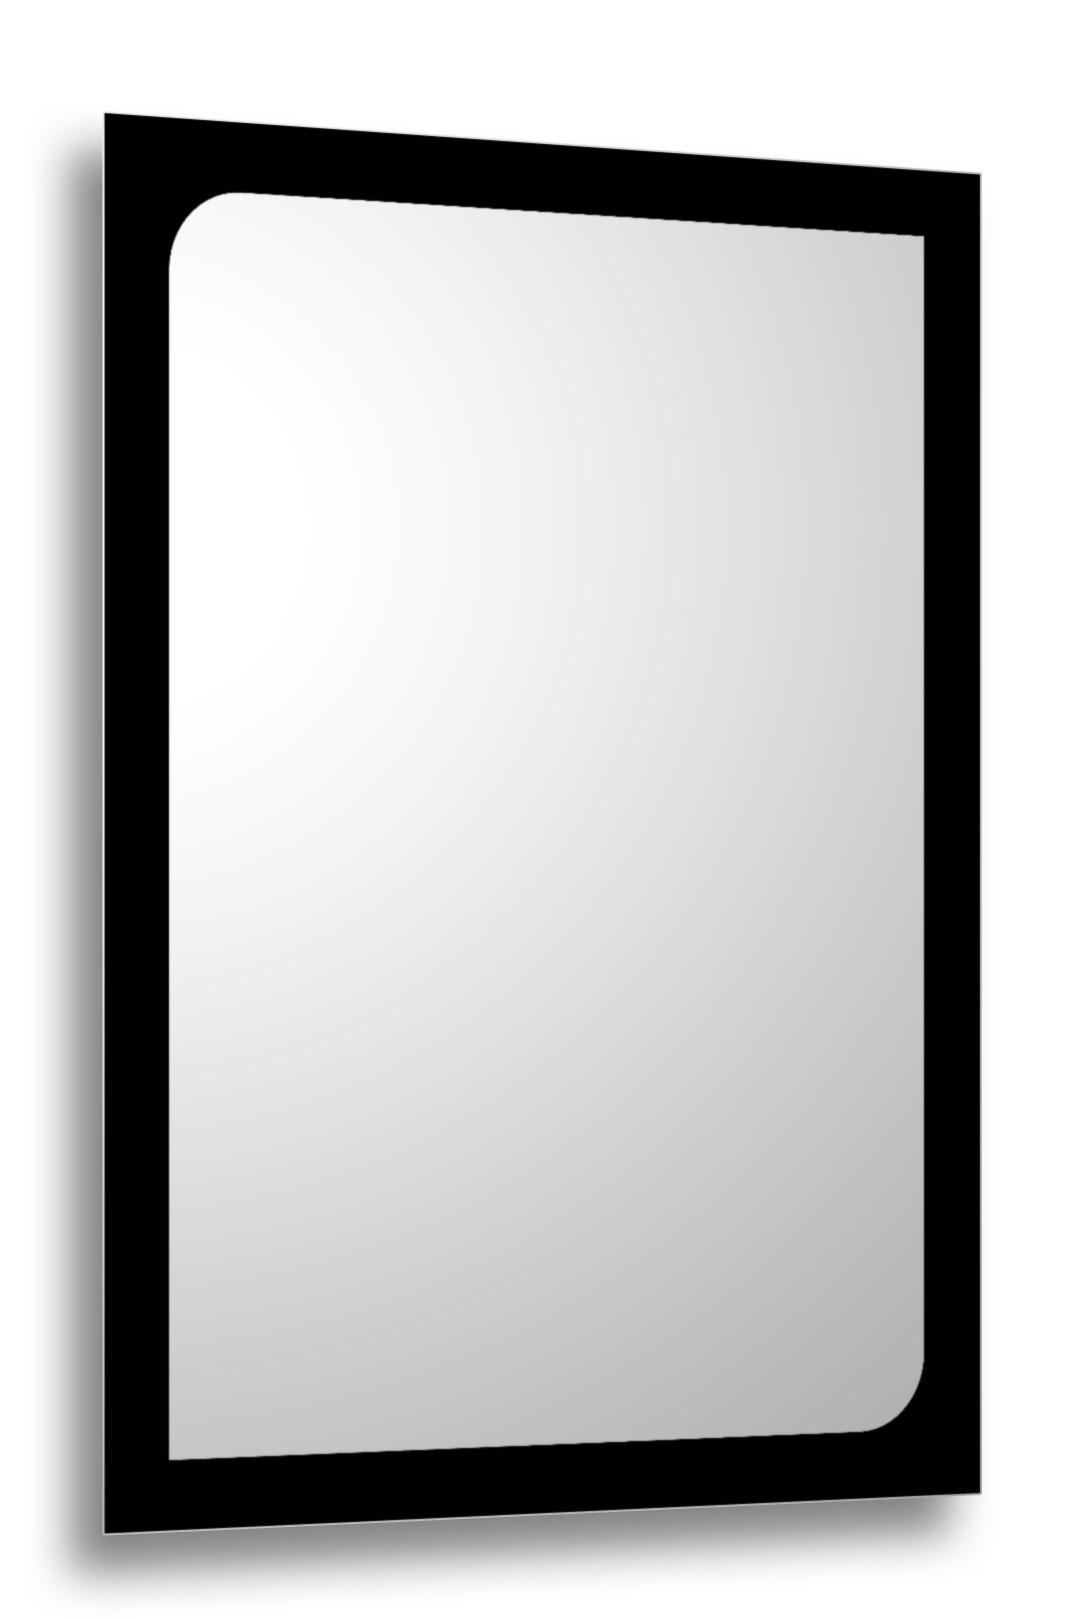 Oglinda baie cu rama printata negru Minho 80x60 cm imagine